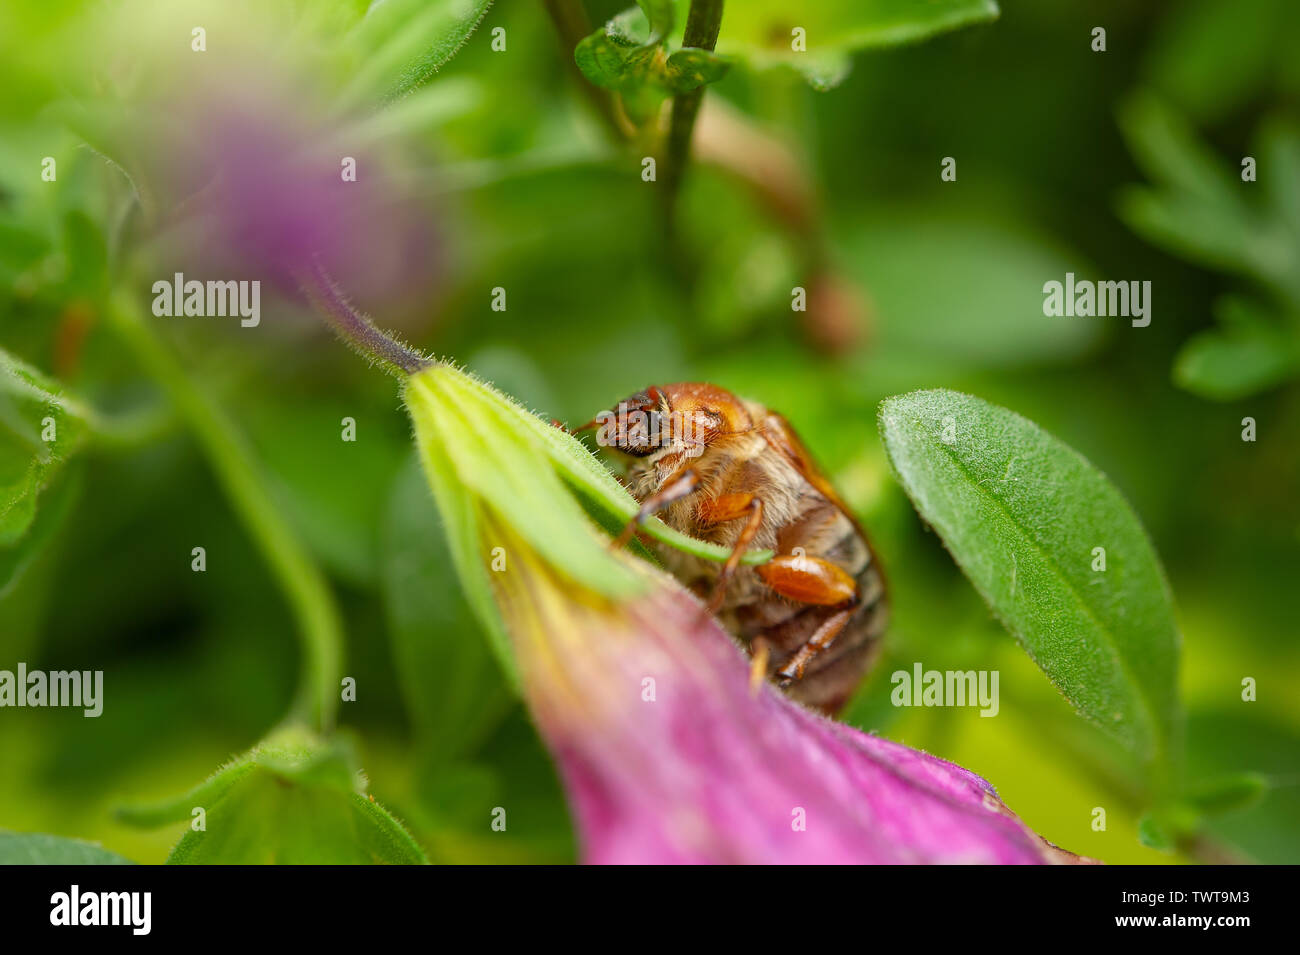 Summer chafer in green leaves. European june beetle on flower. - Stock Image